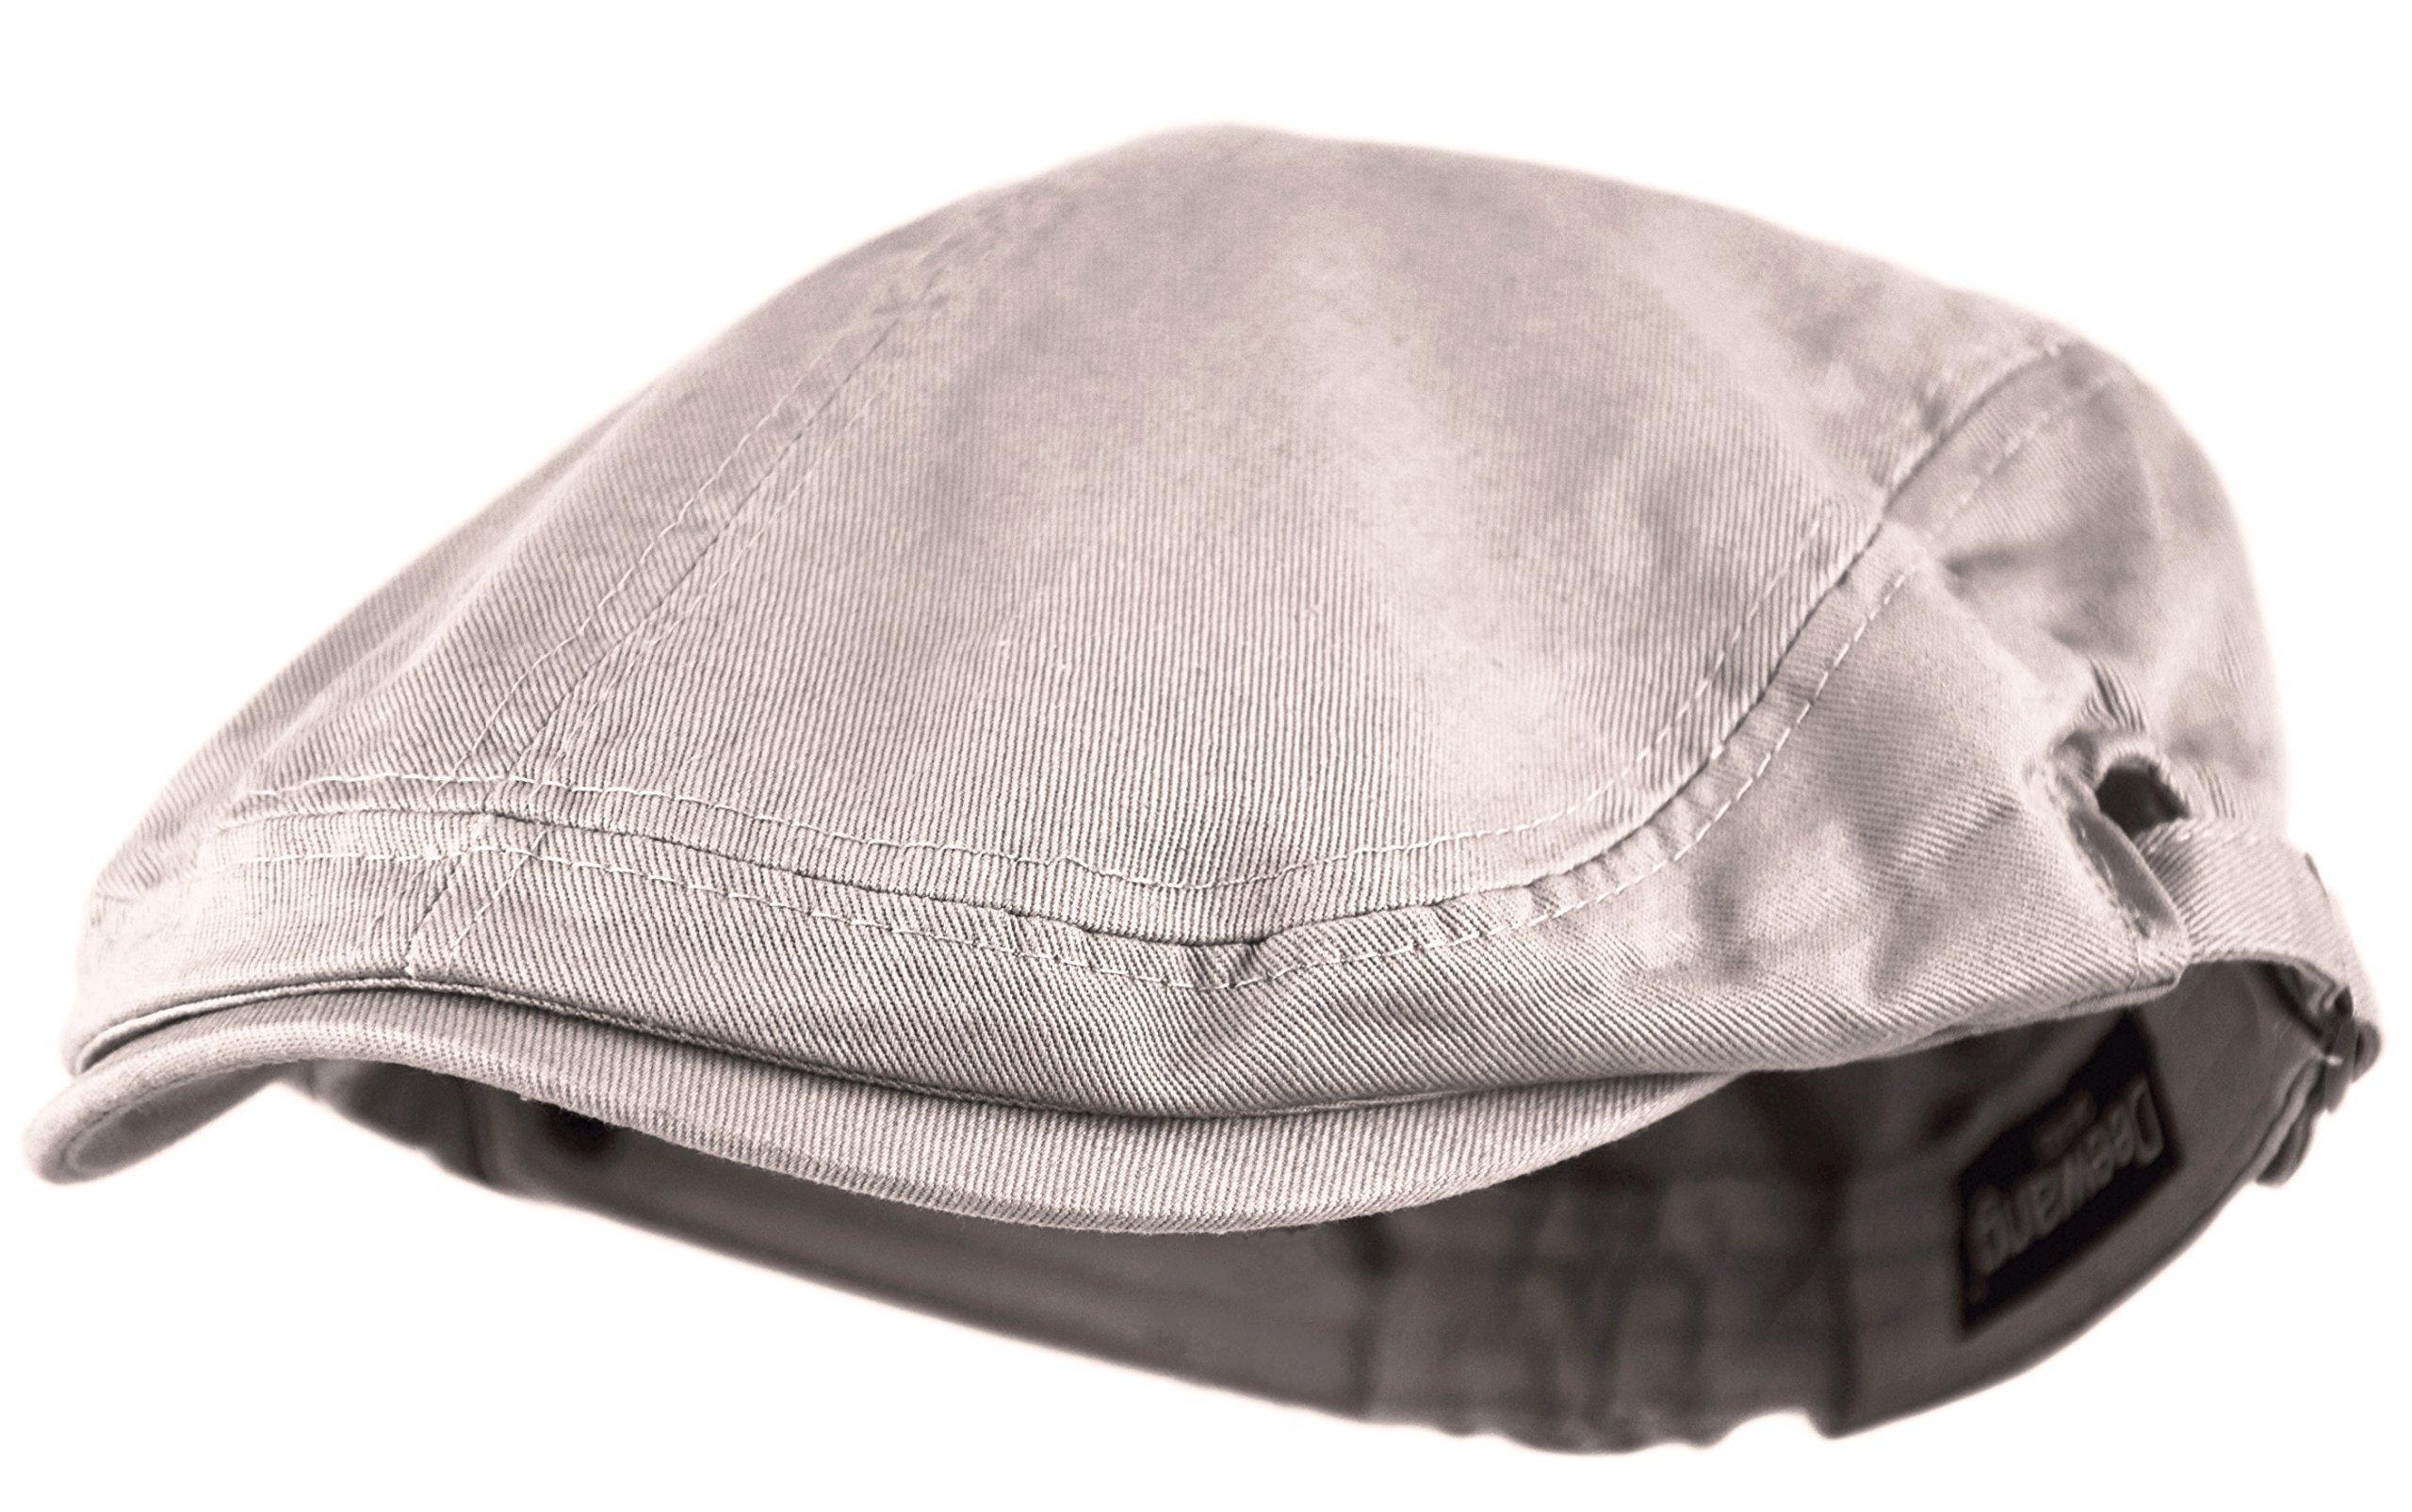 b365eeb68af Deewang Fashion Cotton Cabbie Hat Buckle Golf Ivy Colorful Newsboy Driving  Cap (Beige) Apparel